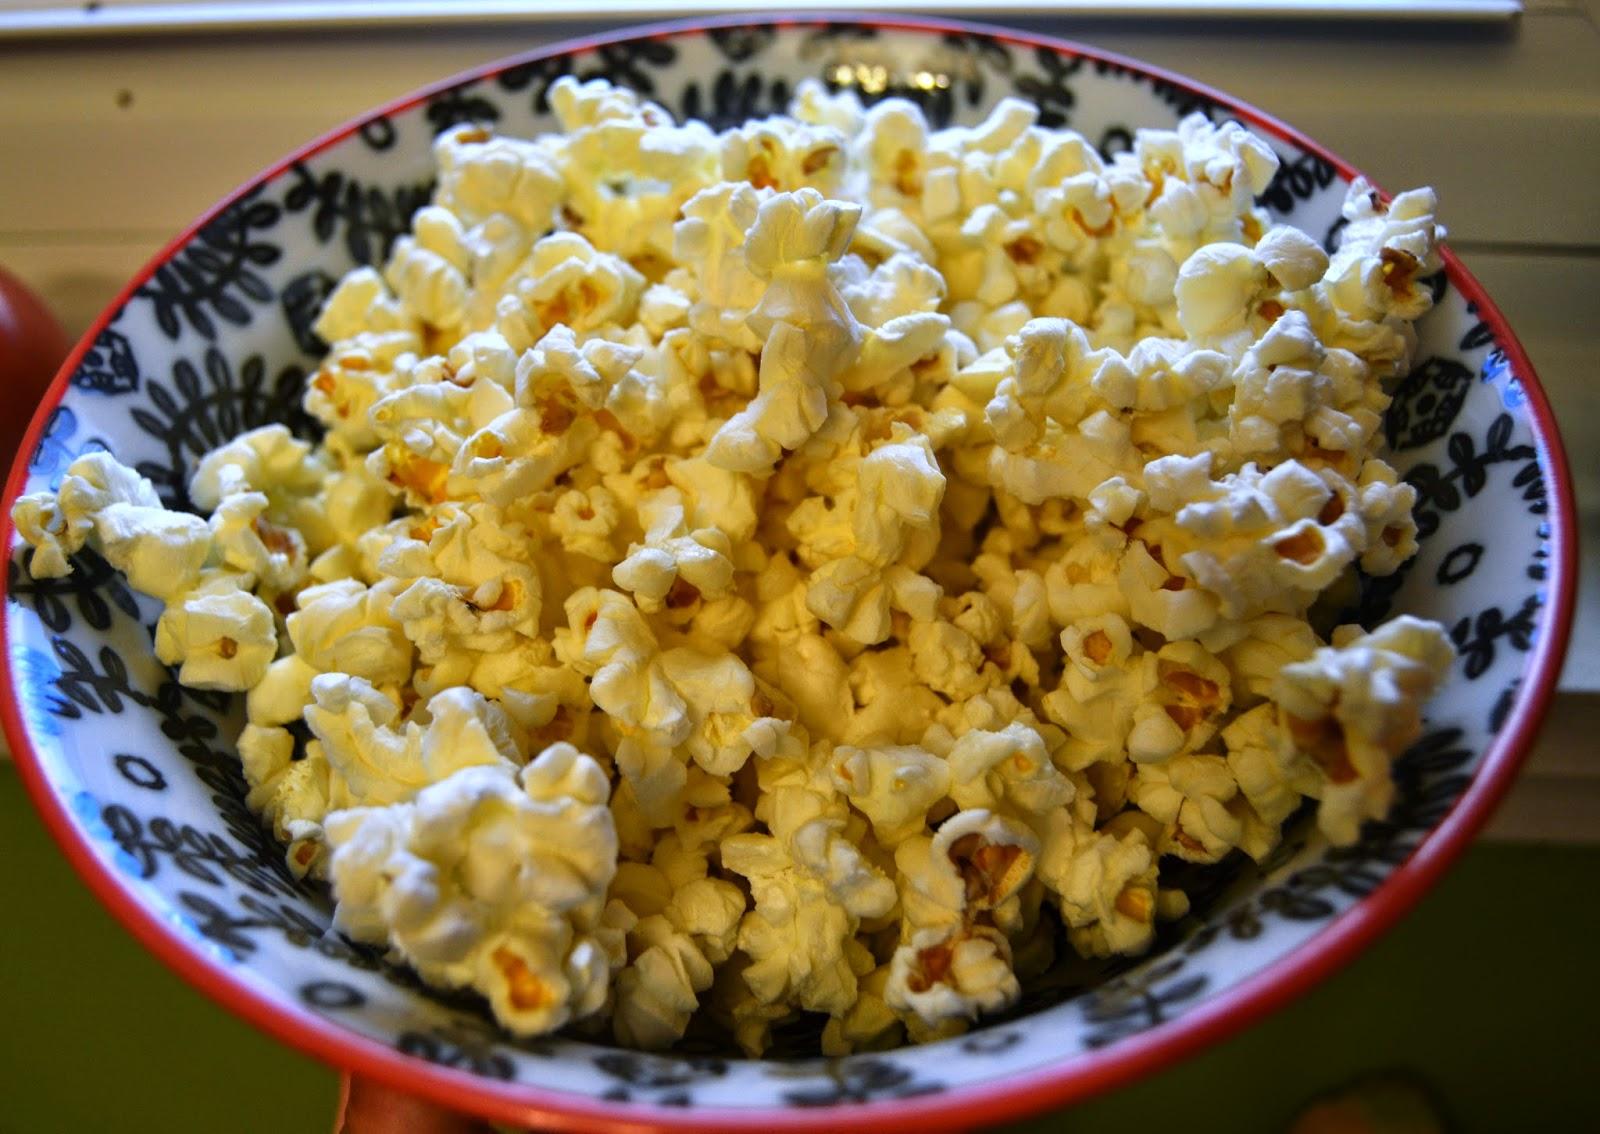 Skinnygirl Popcorn